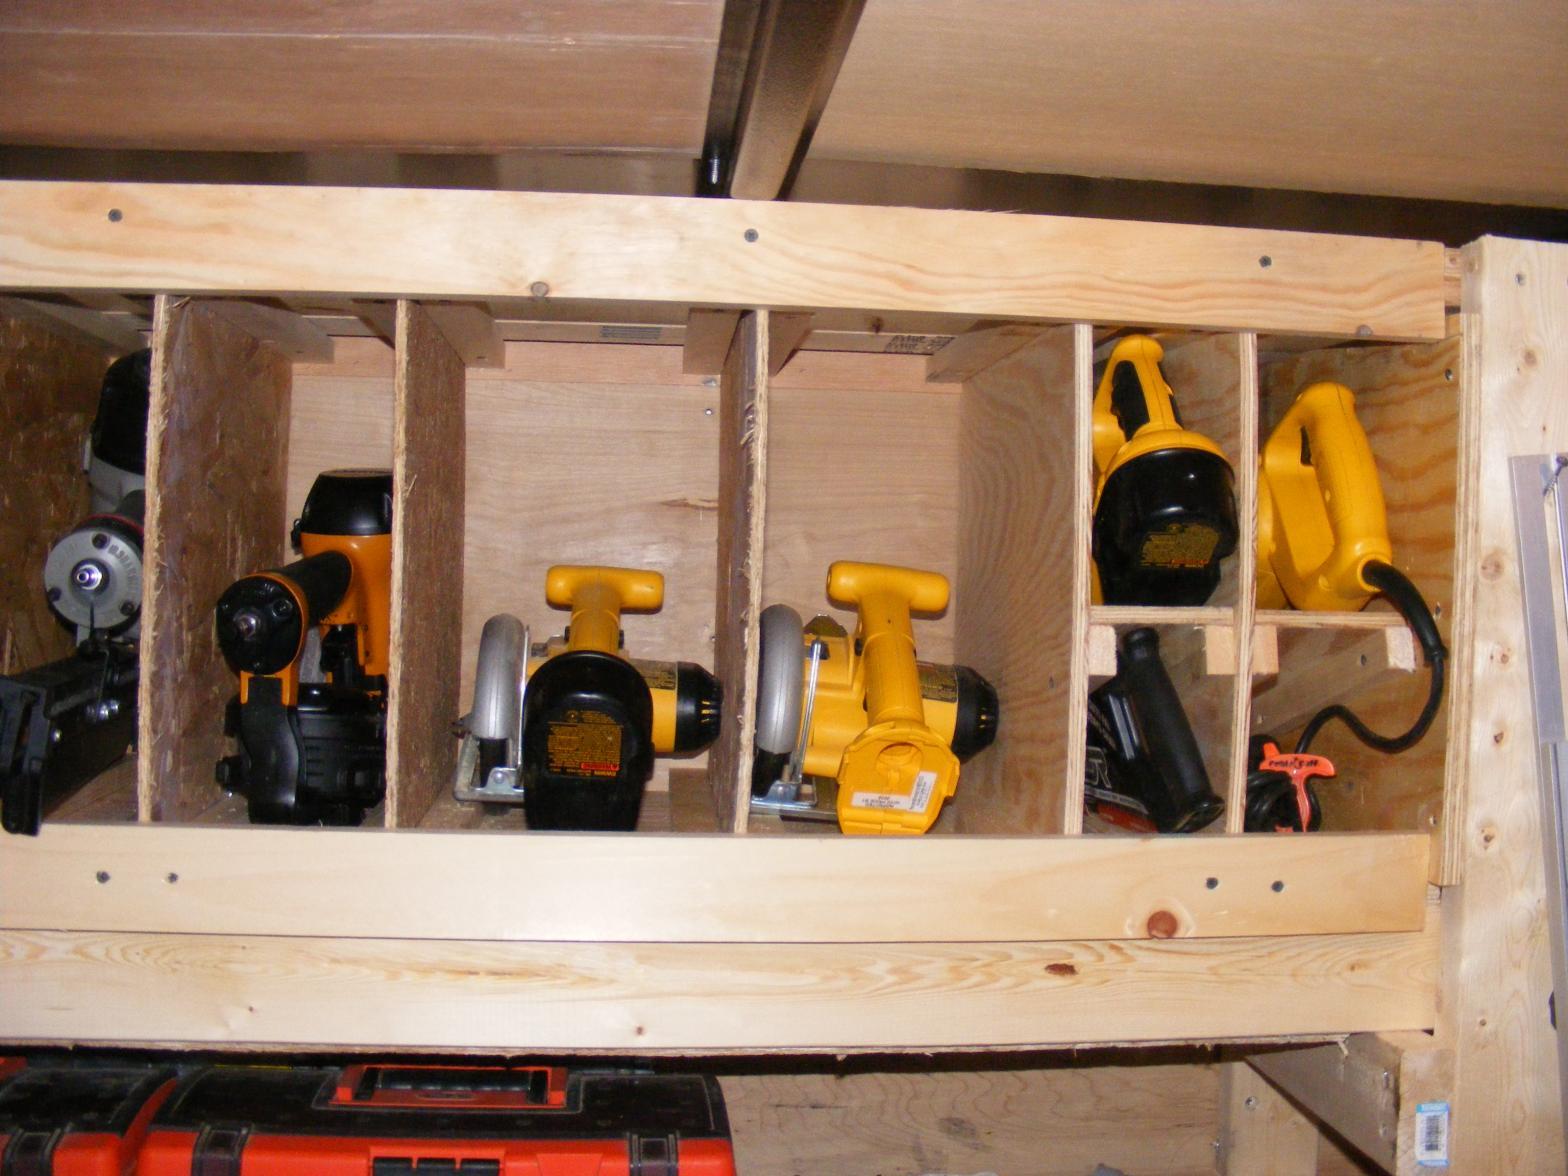 storing cordless tool sets-dscf3196.jpg